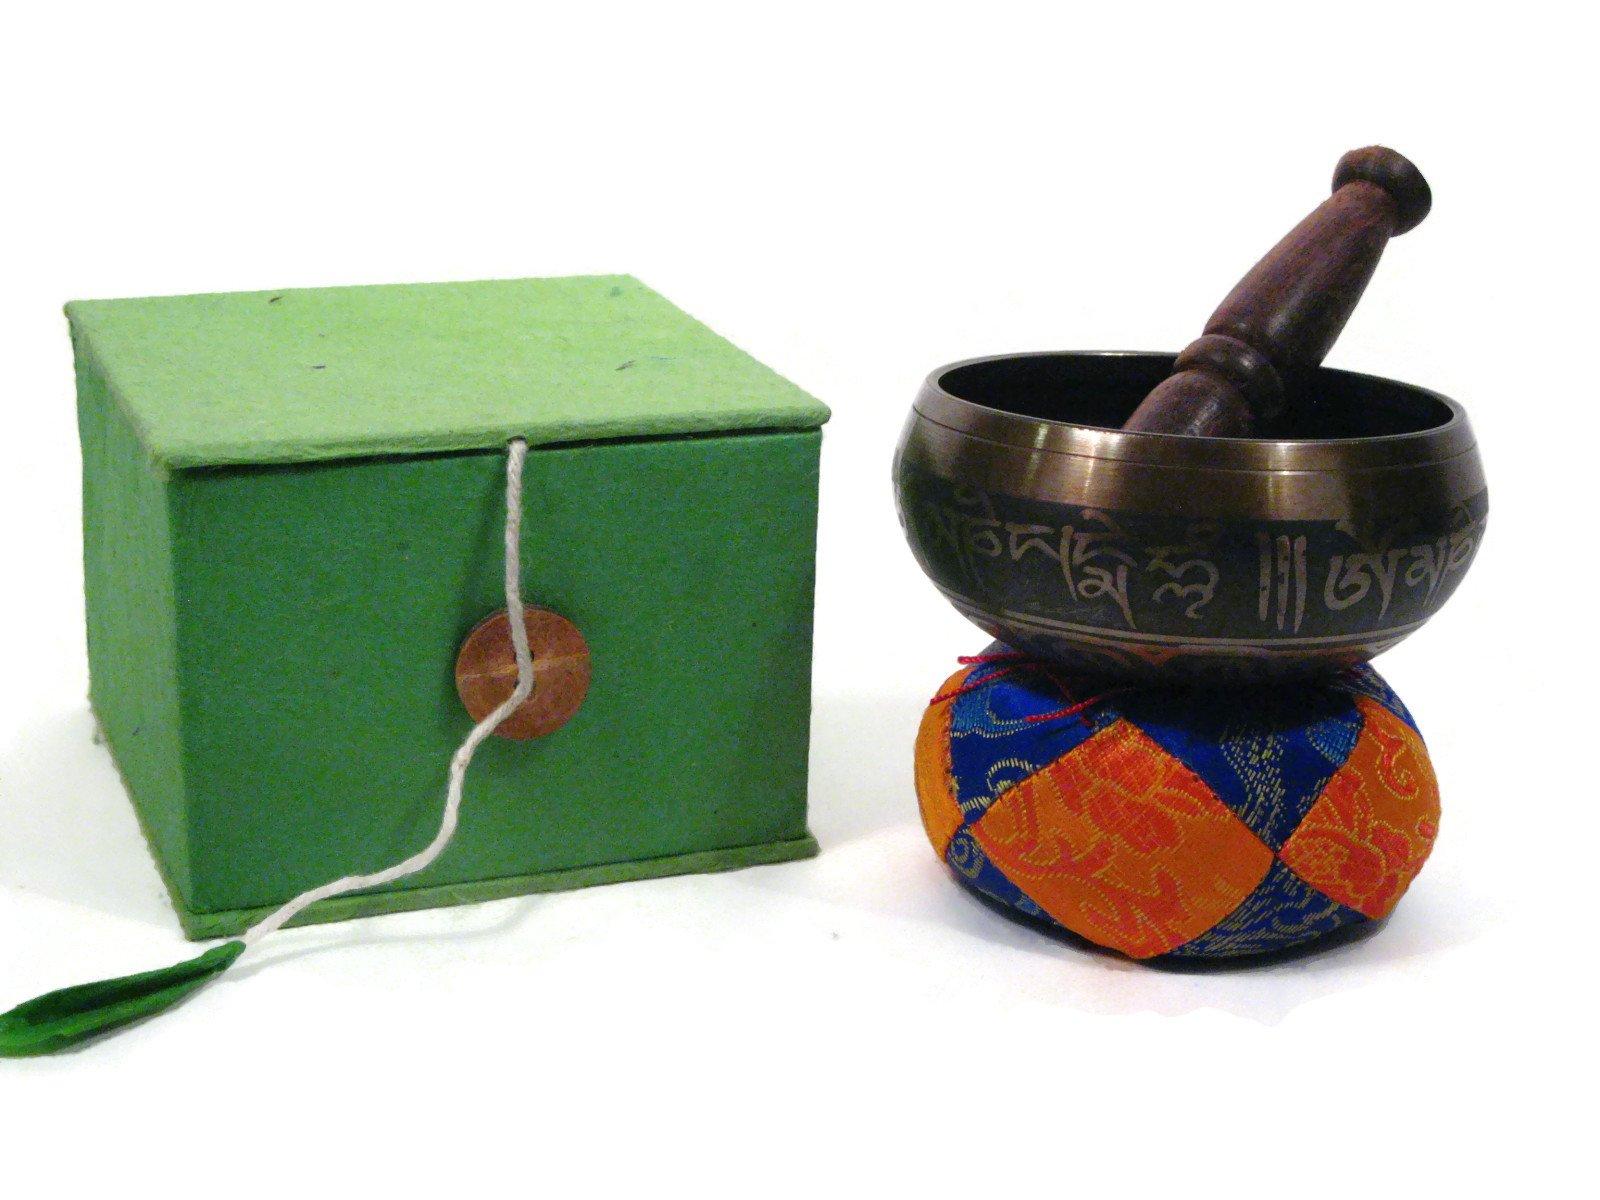 Tibetan Meditation OM Singing Bowl. Includes Cushion, Wooden Ringer, and Storage Box. Balances Chakras, Healing.